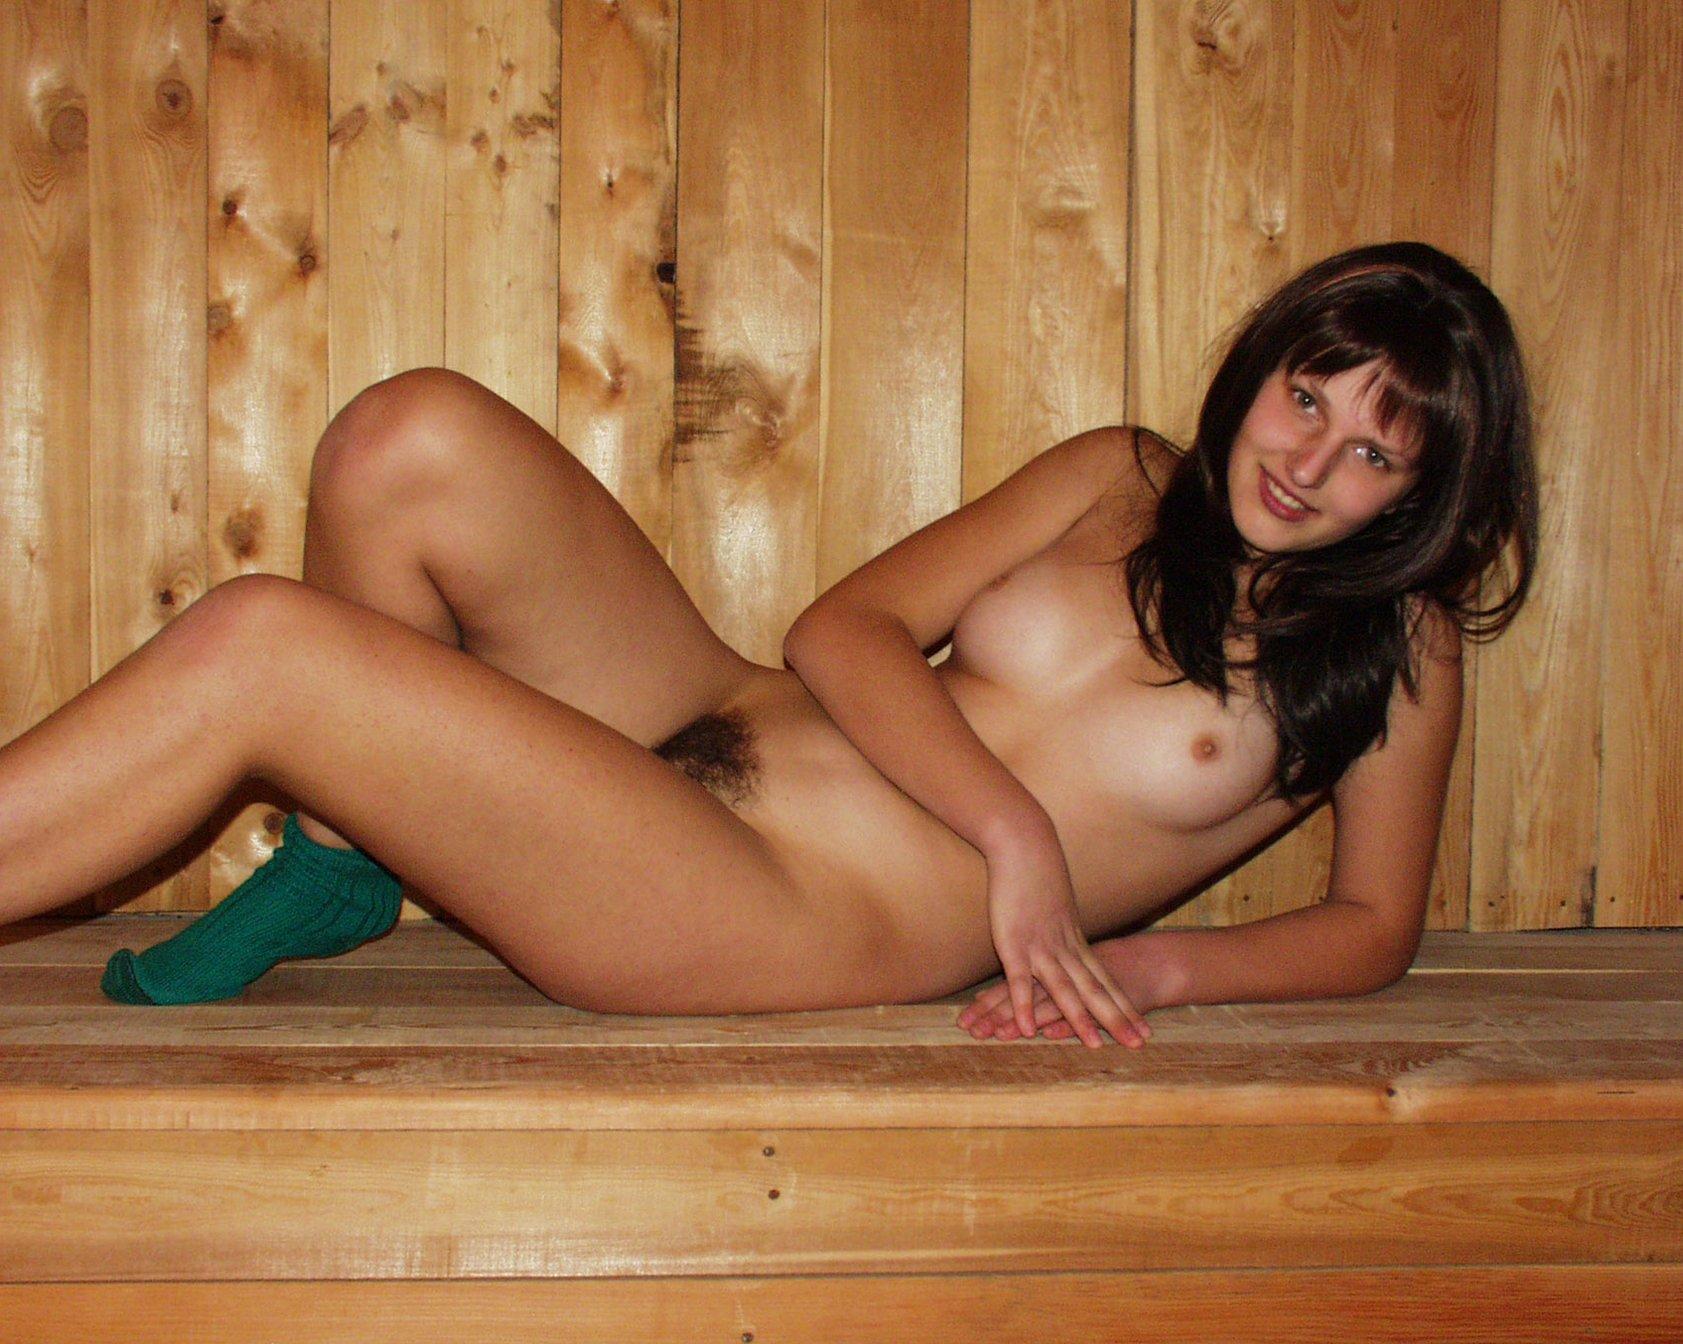 Фото голых девчат xxx онлайн 22 фотография